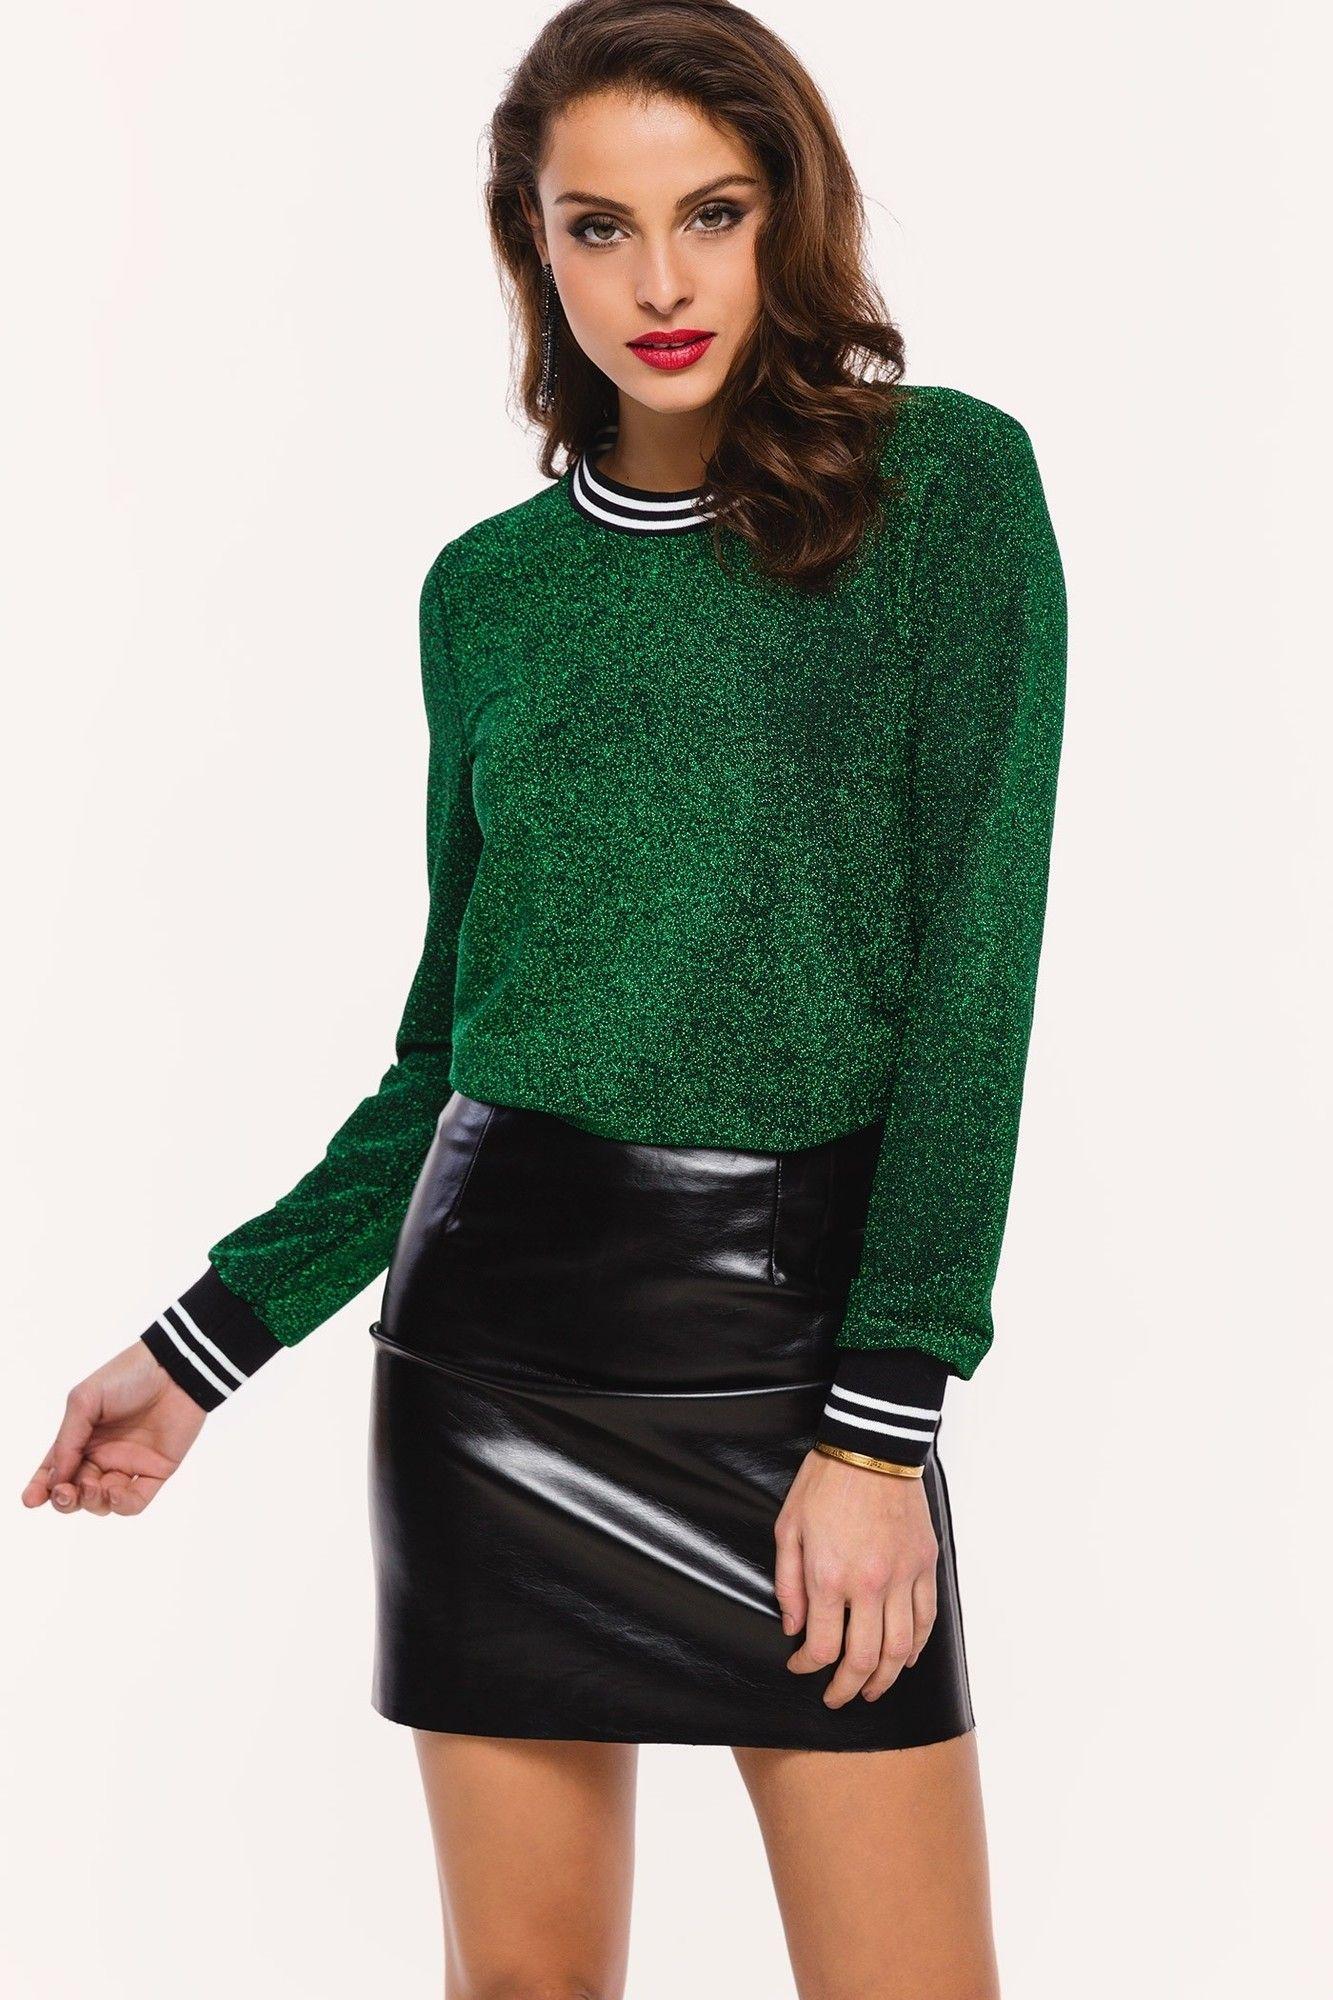 Loavies groene glitter trui | Fashion Webshop LOAVIES